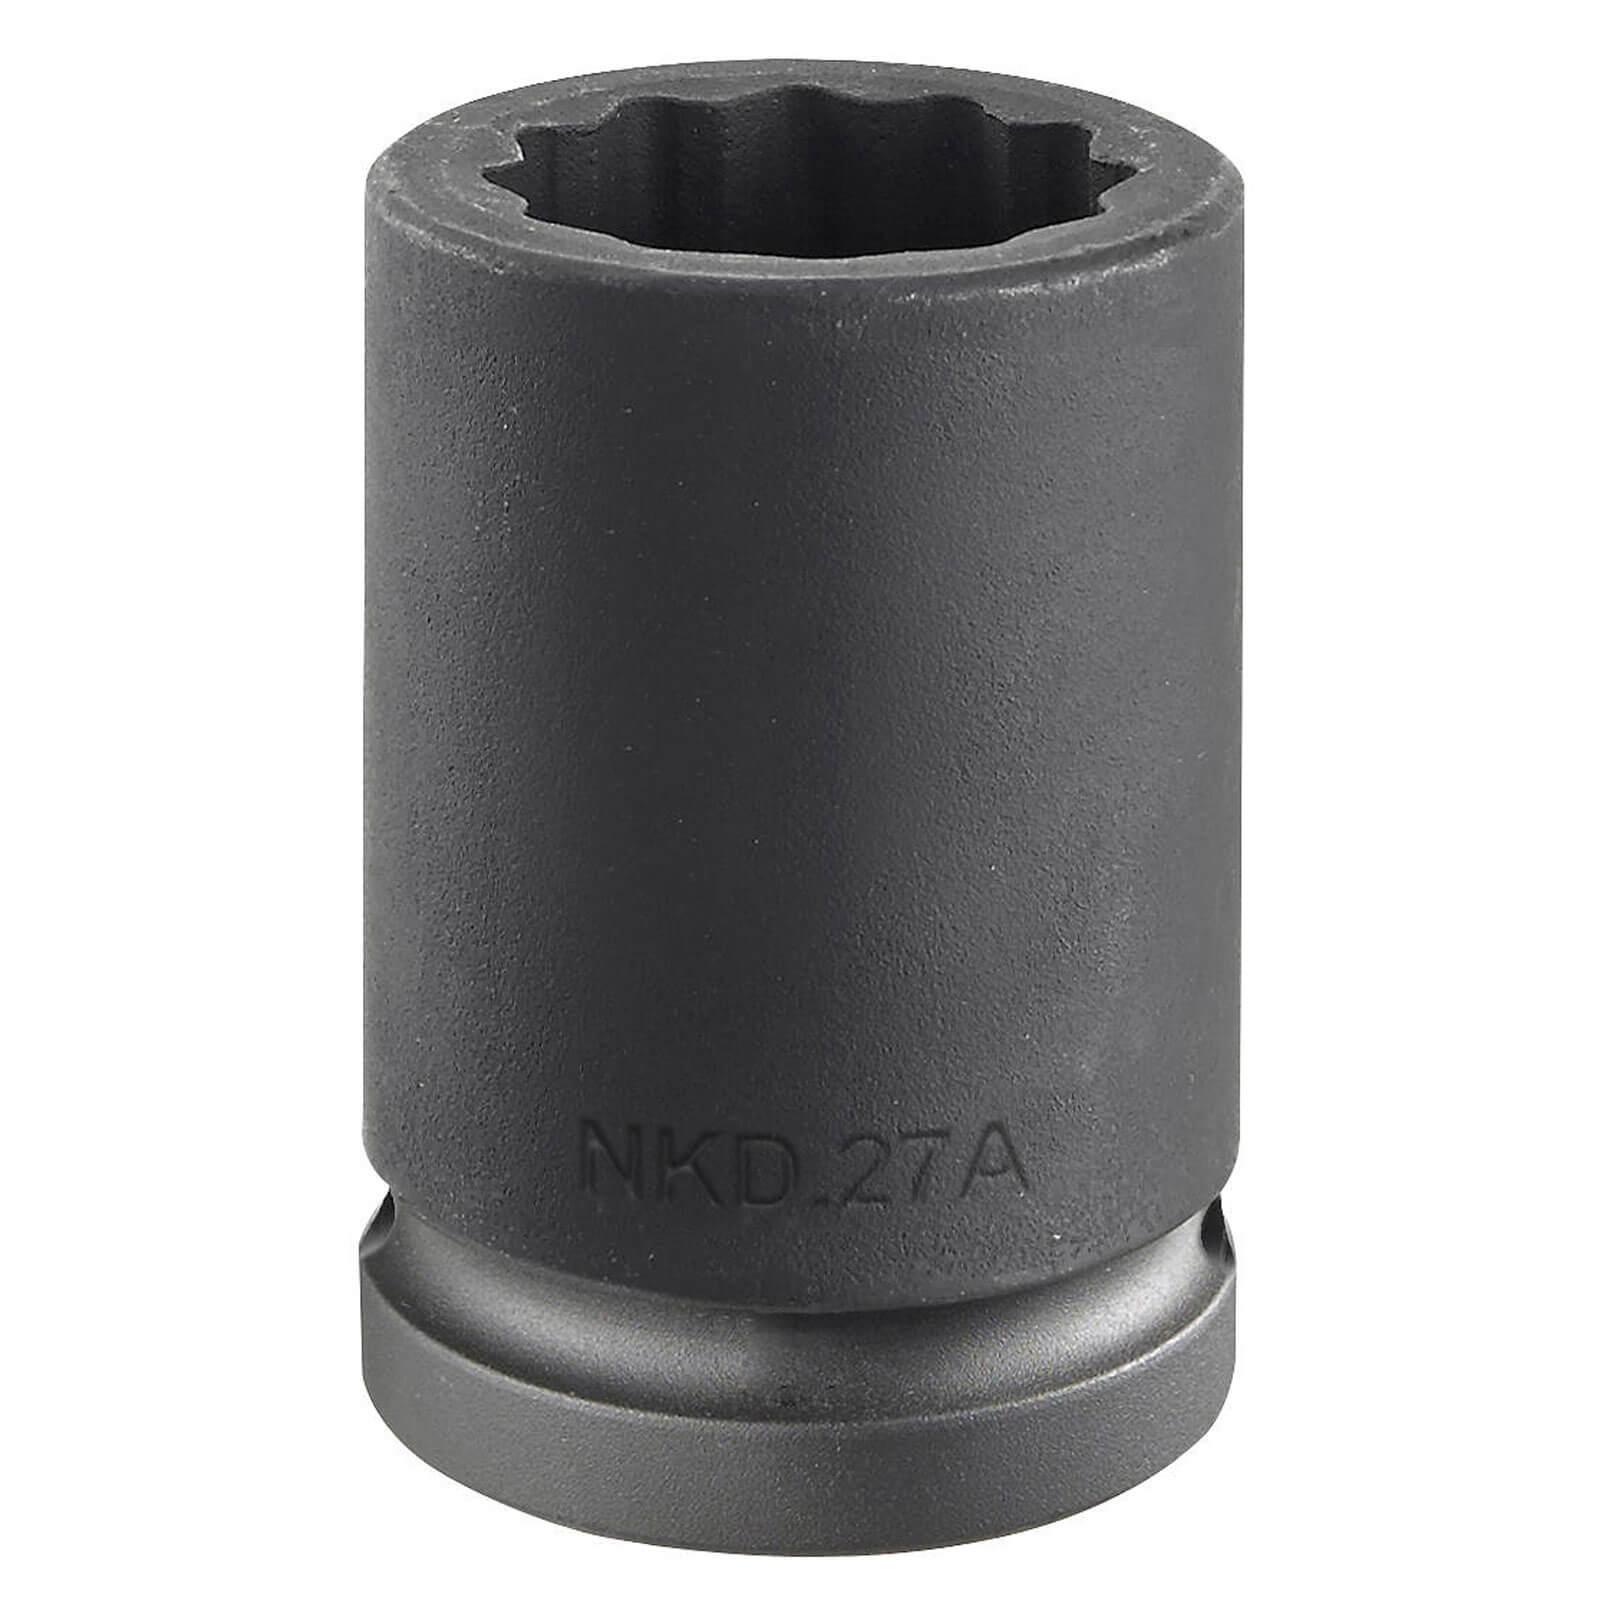 "Image of Facom 3/4"" Drive Bi Hexagon Impact Socket Metric 3/4"" 36mm"